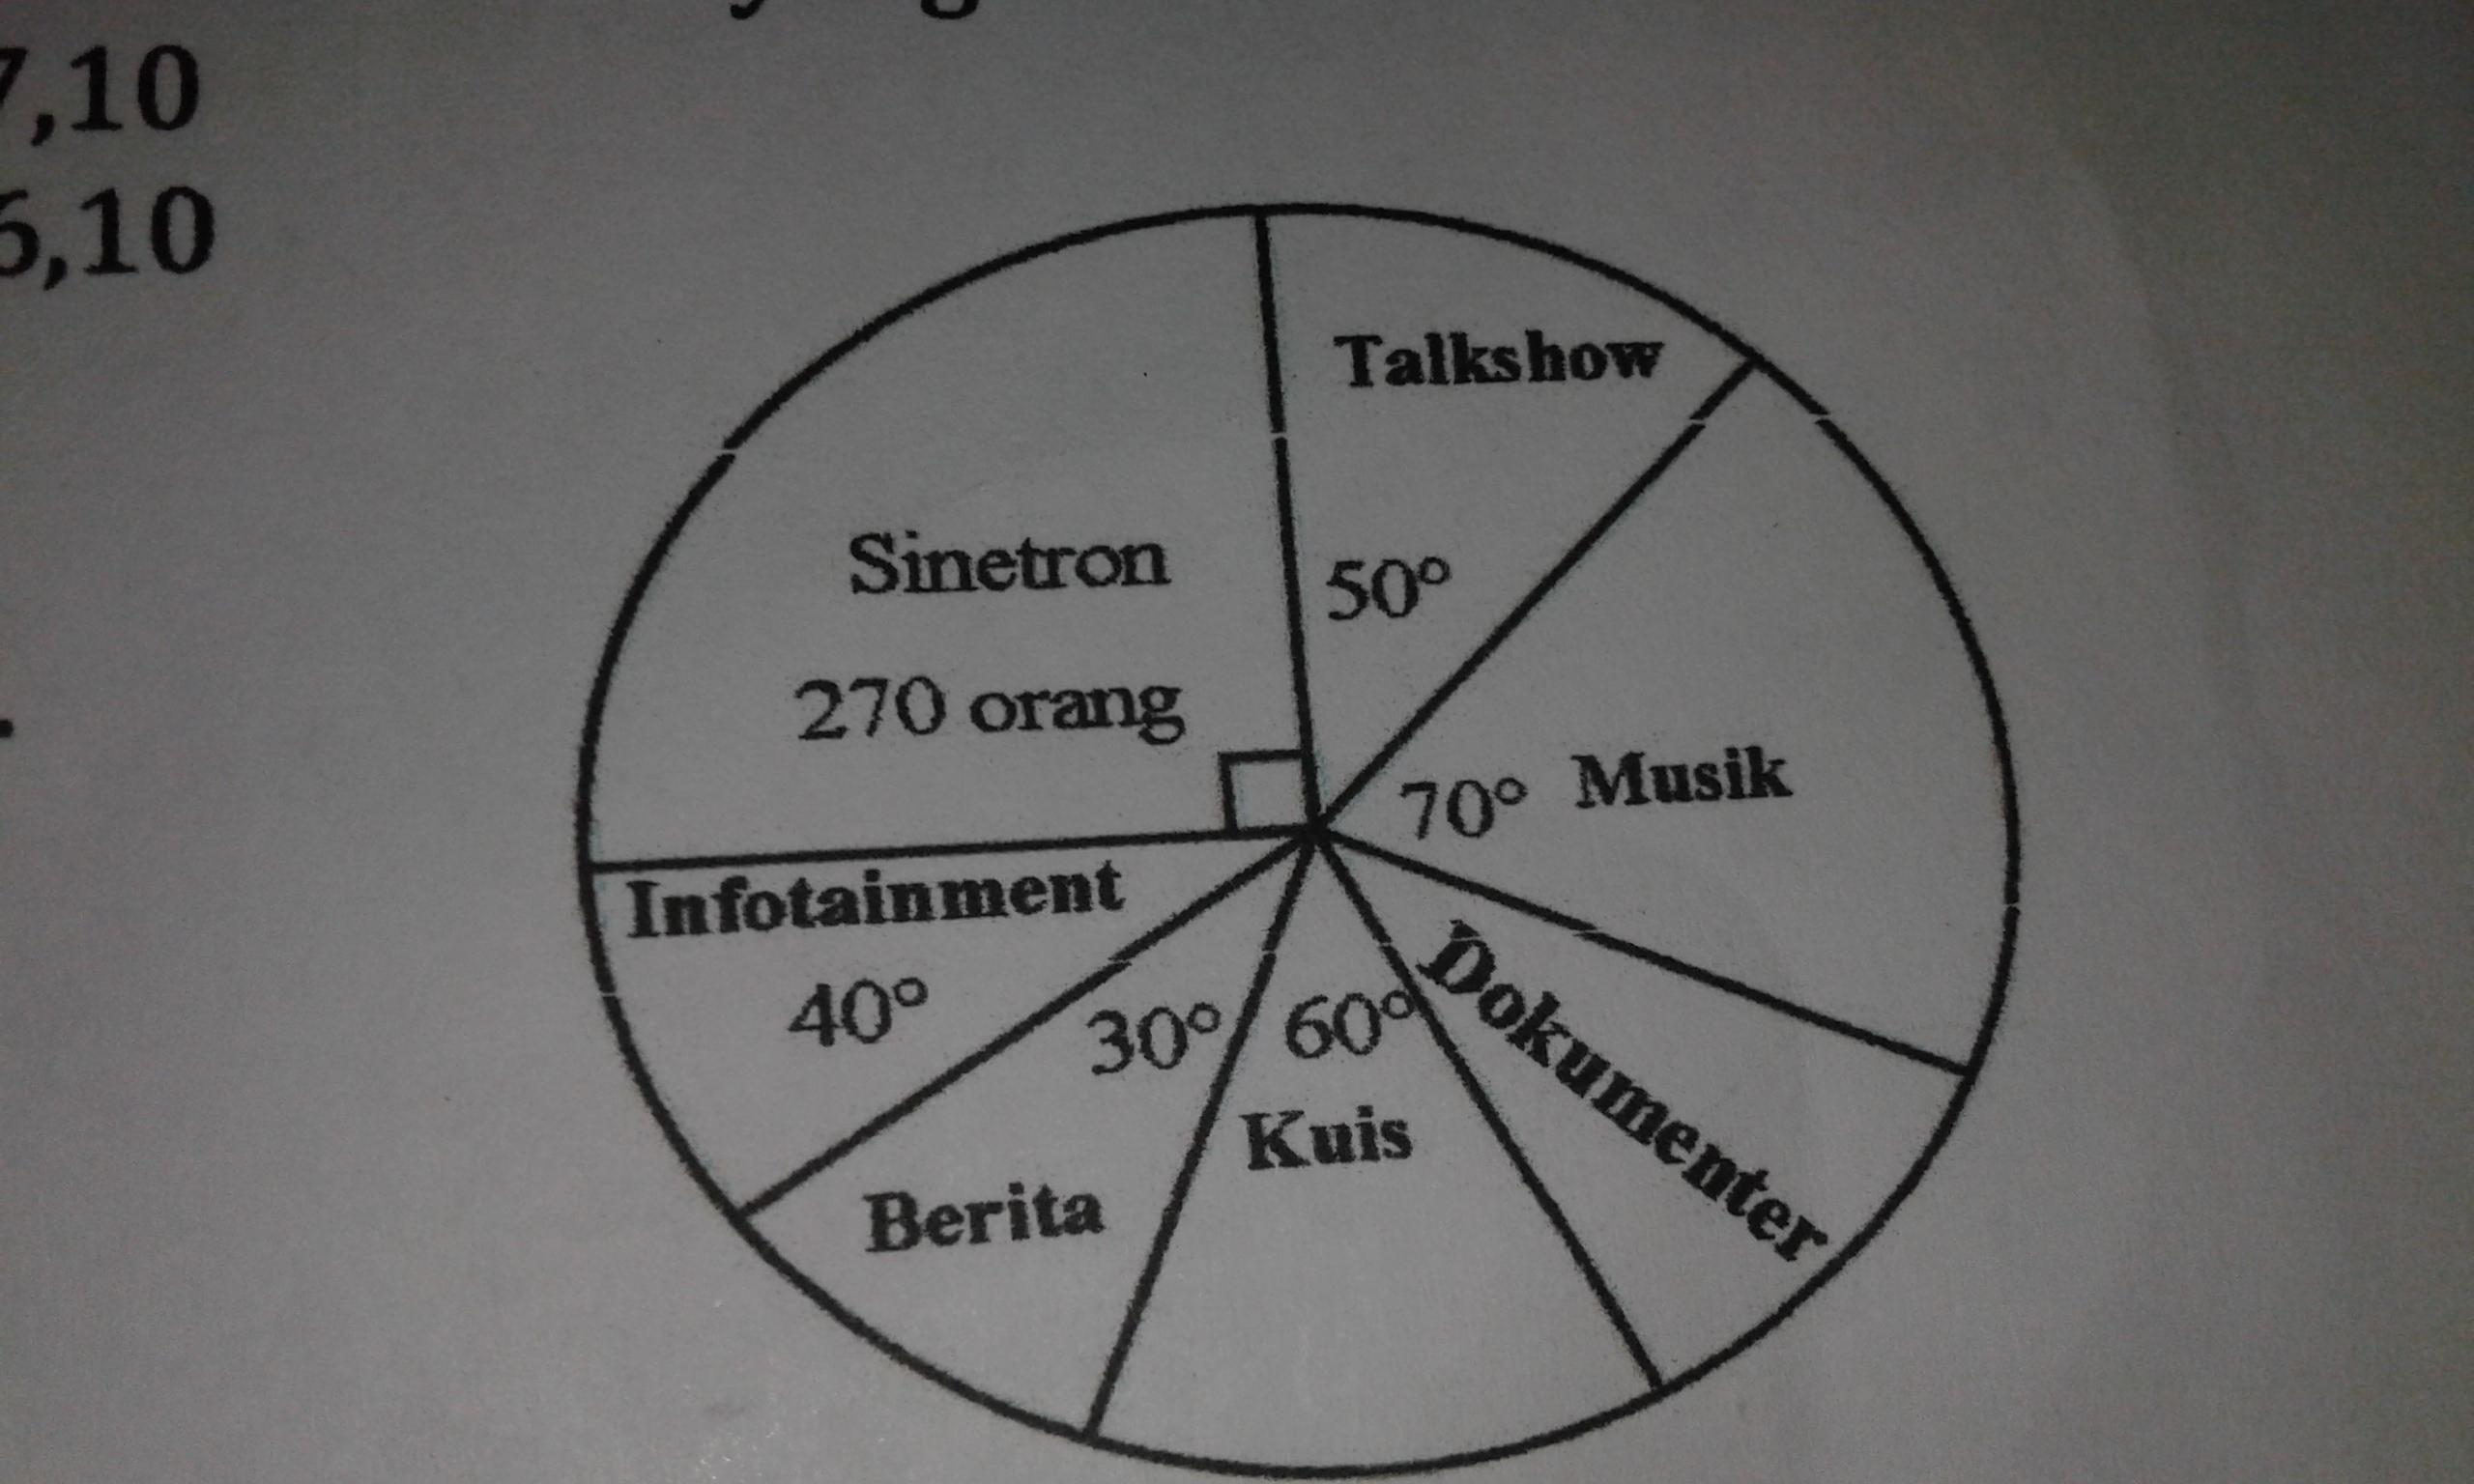 Tolong di jwab ya perhatikan gambar diagram lingkaran di samping unduh jpg ccuart Choice Image